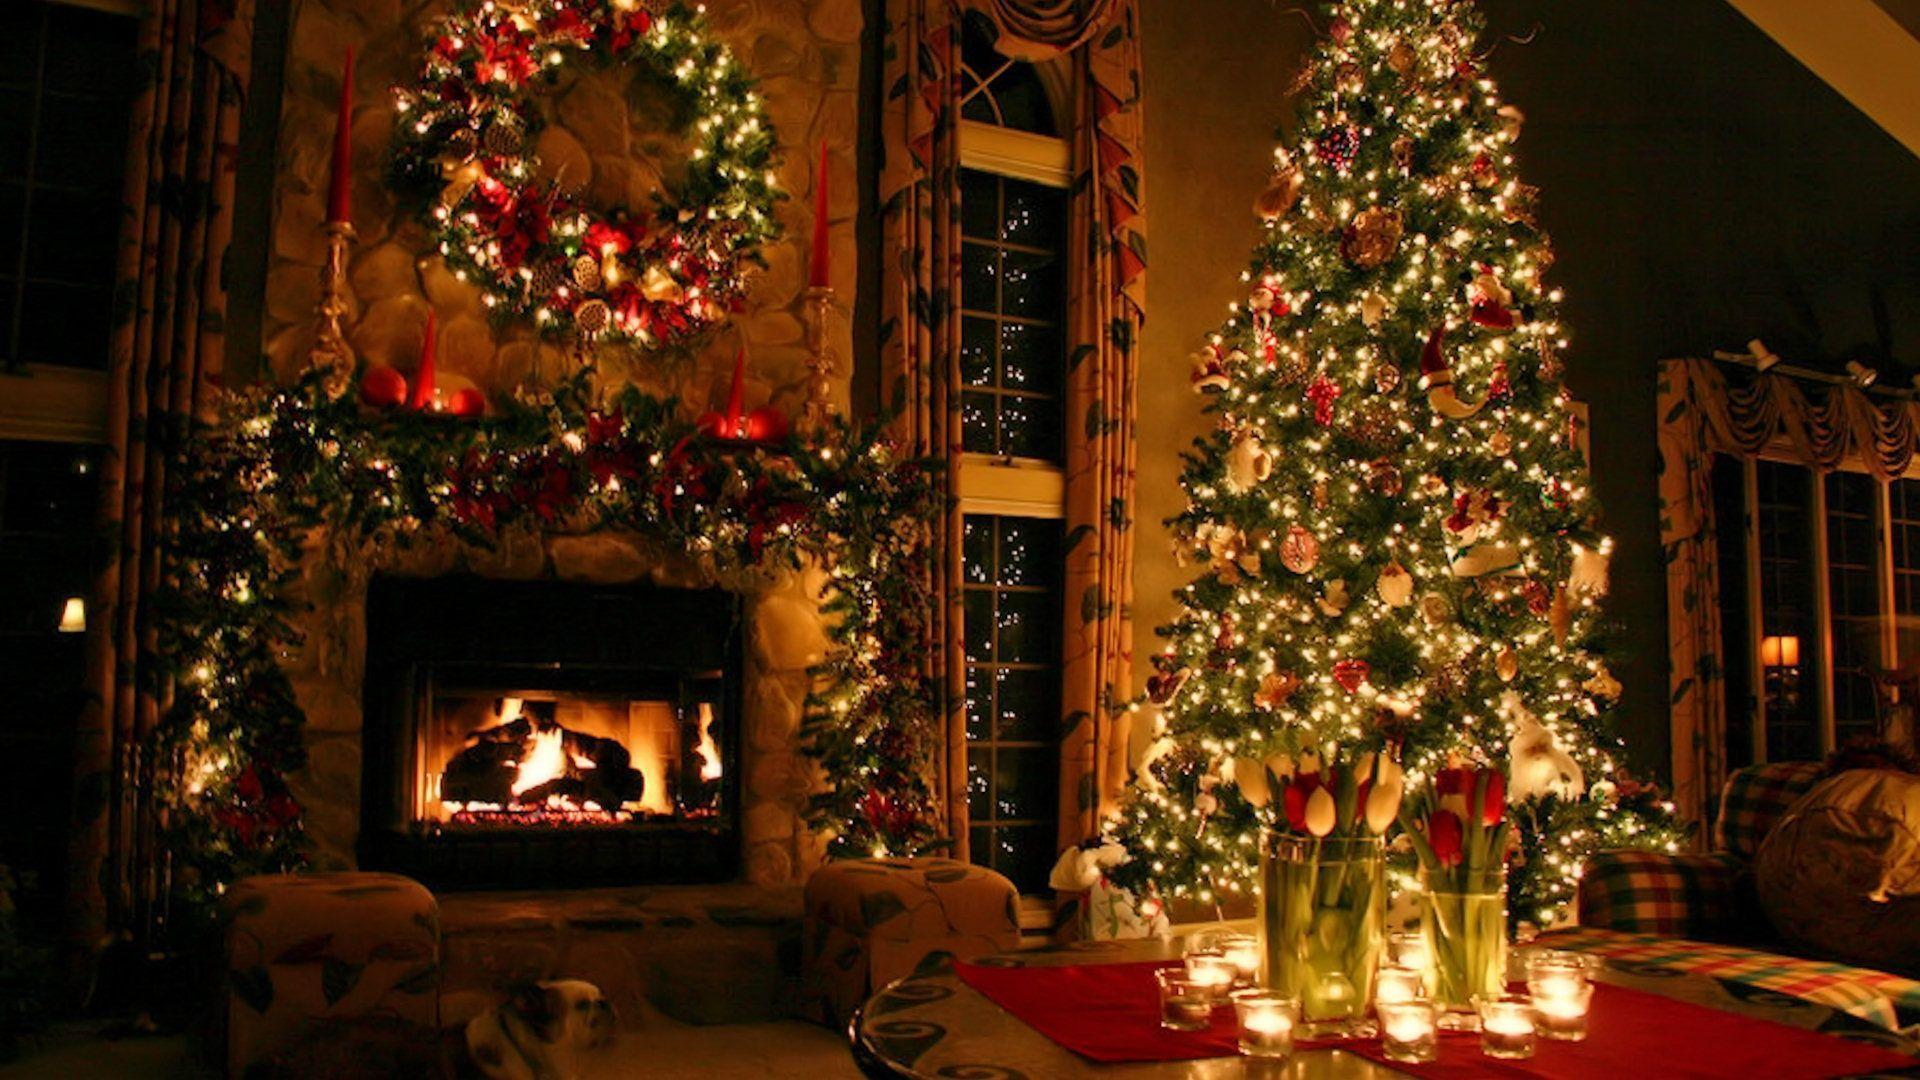 Christmas Wallpapers Backgrounds - Unique Wallpaper